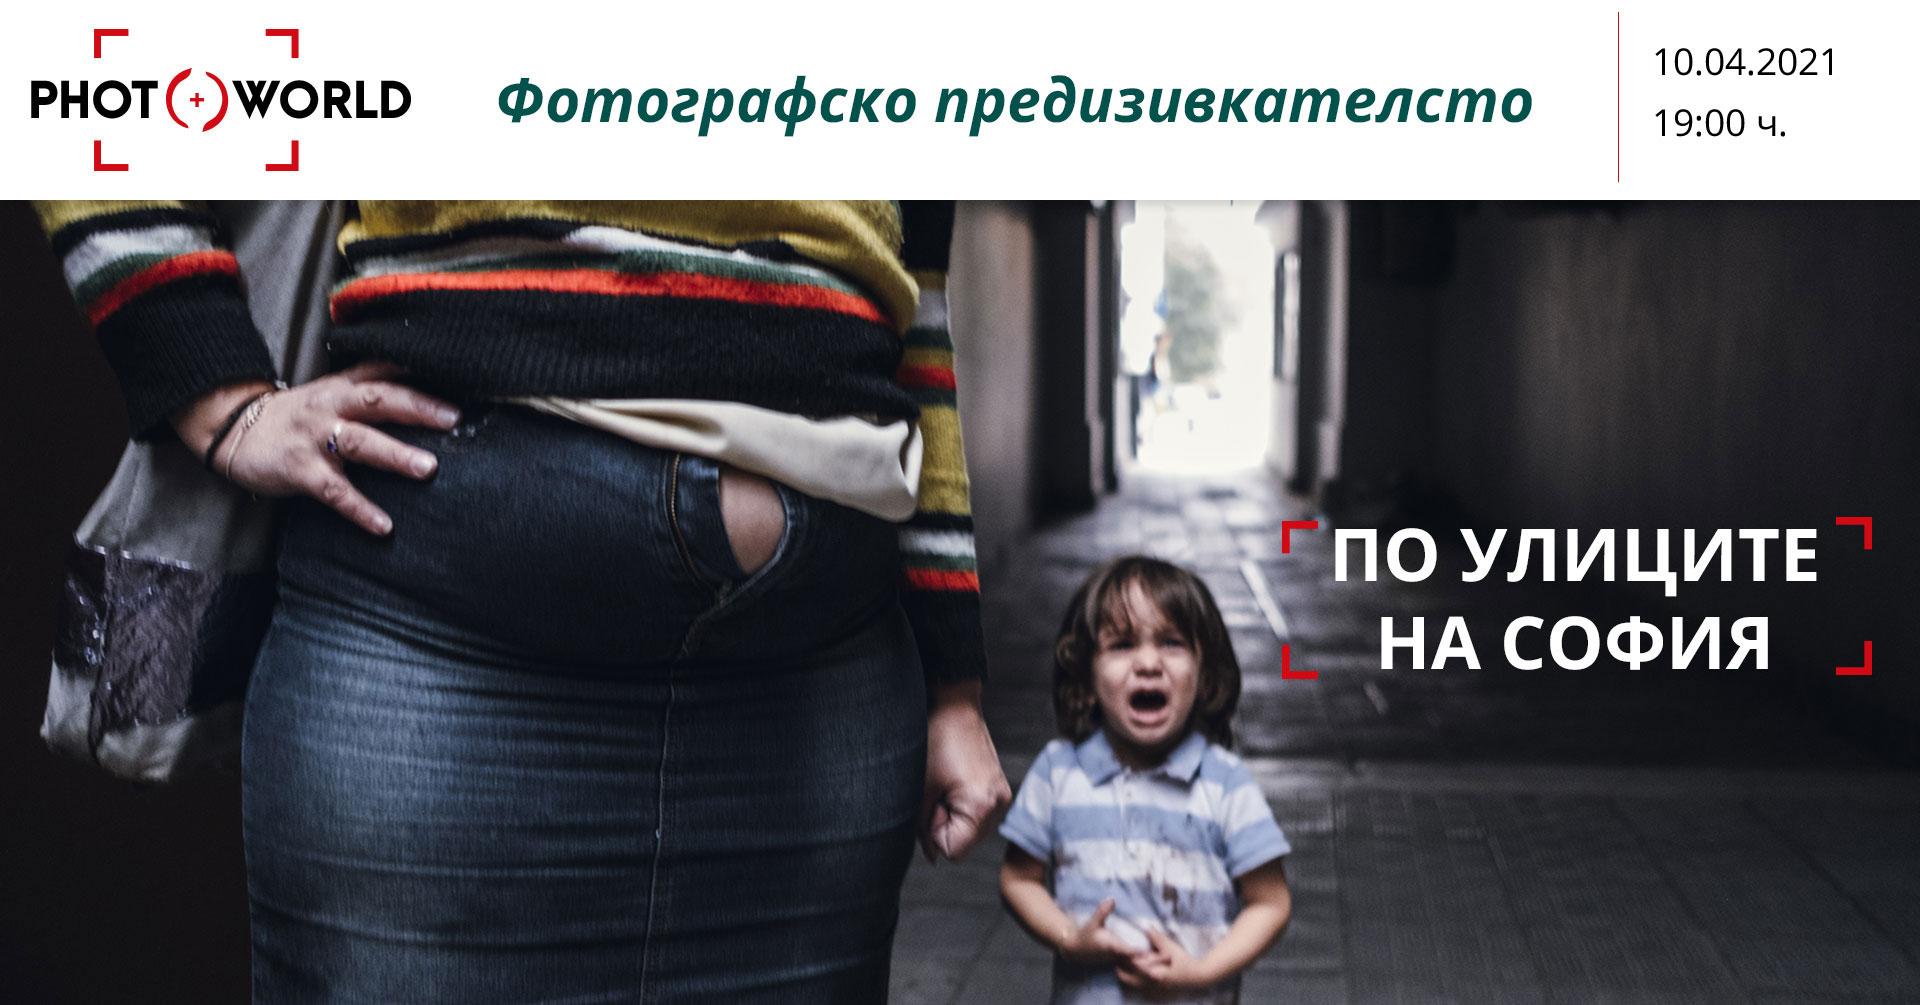 """По улиците на София"" с Пенко Скумов и Свилен Начев"